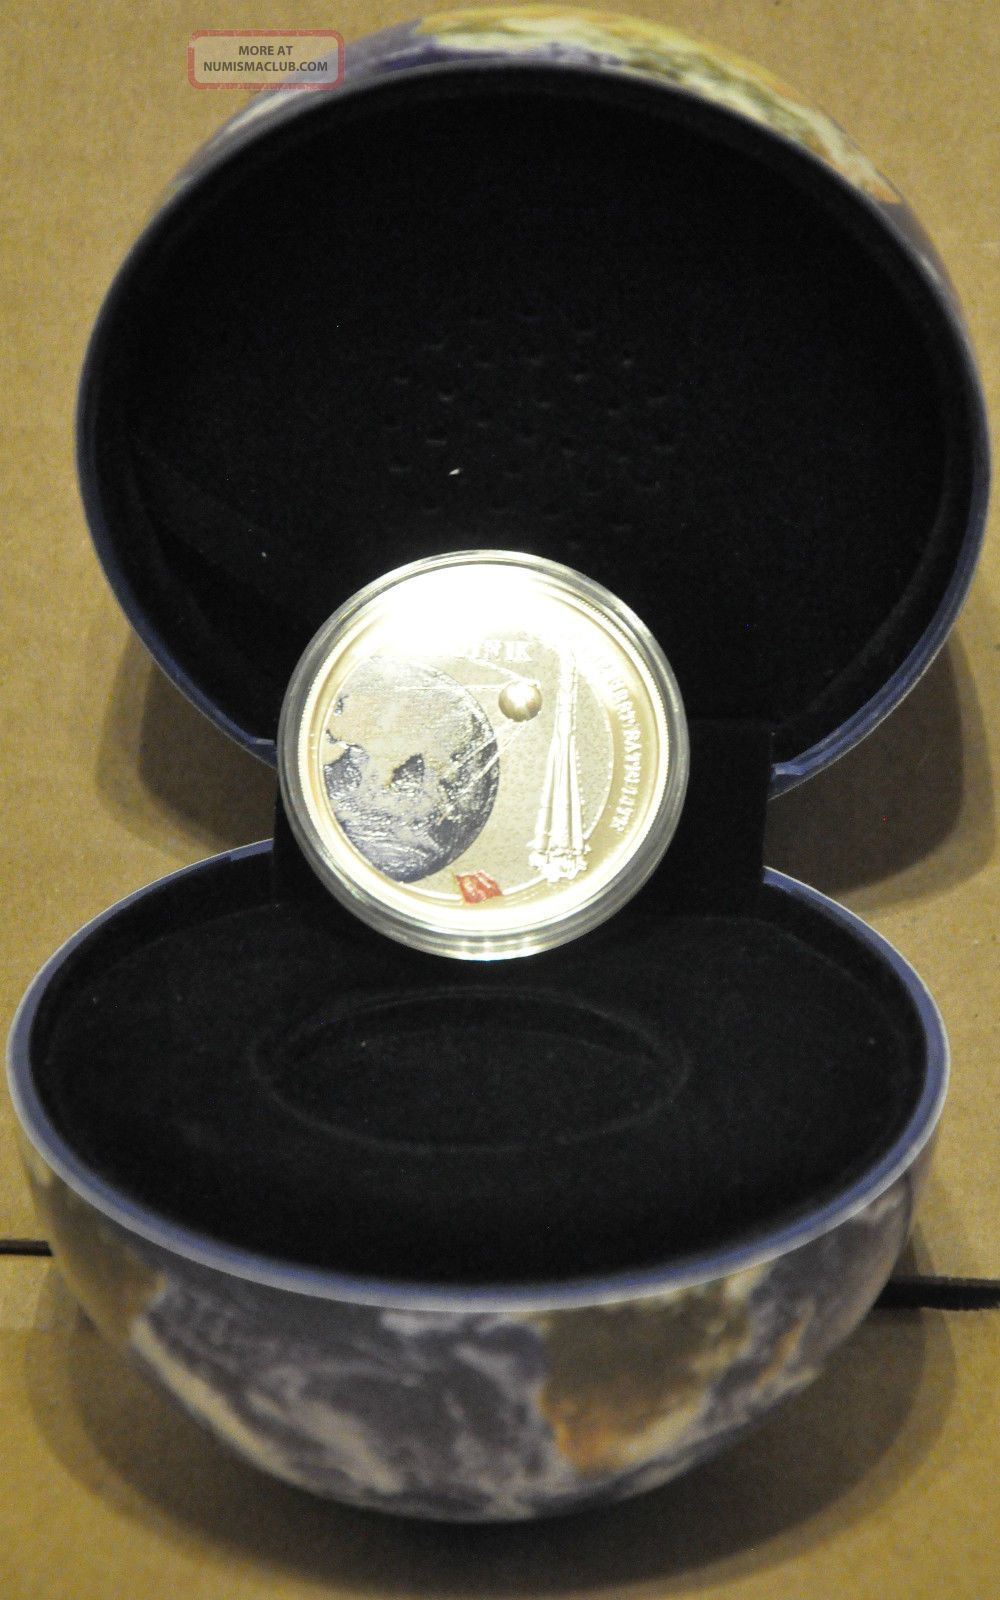 2007 Fiji 2 1957 Sputnik 1oz Silver Coin Colored